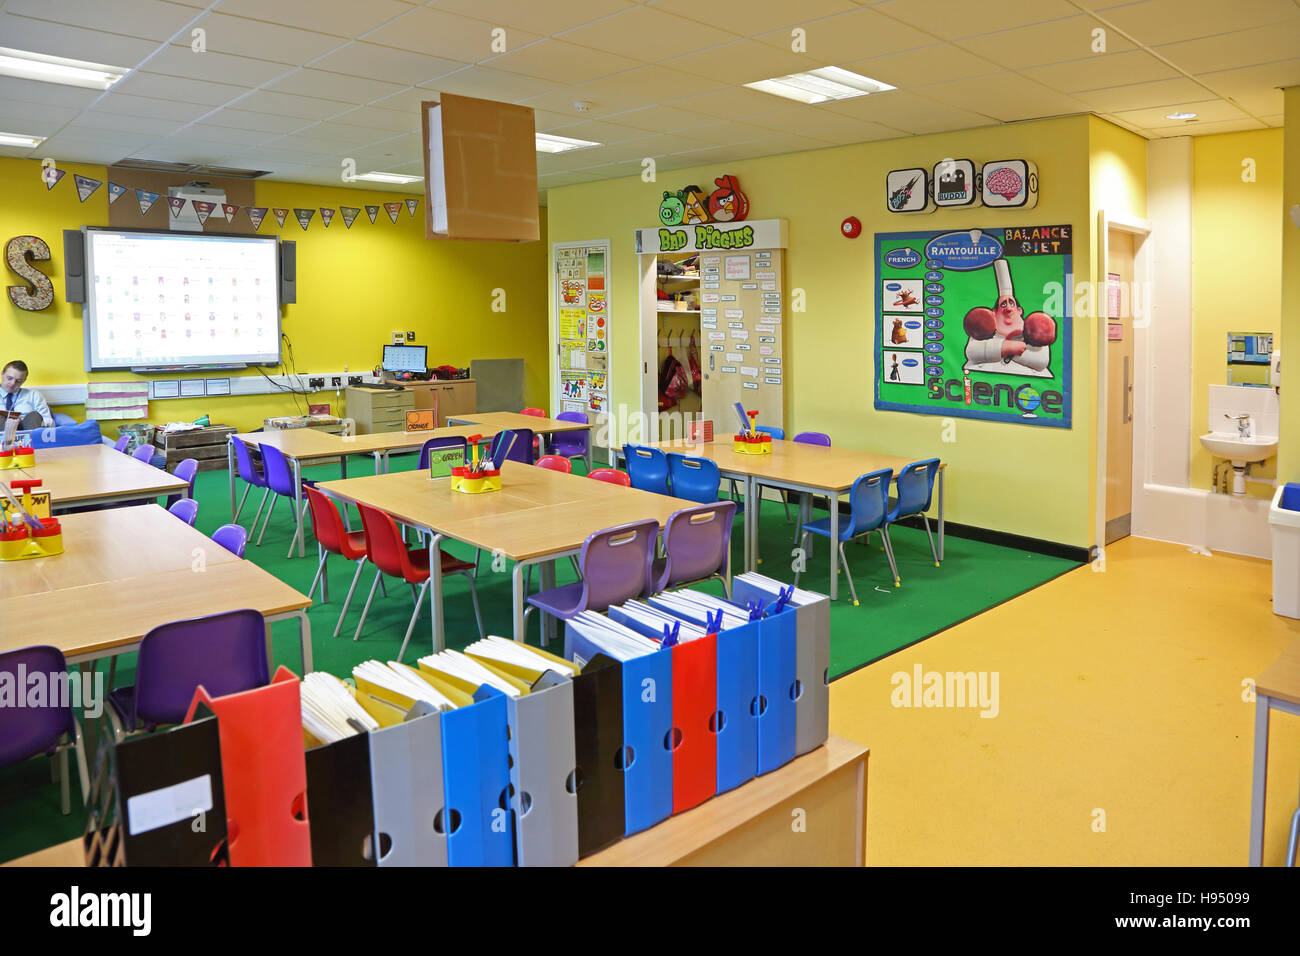 Brightly coloured interior of a modern year 1 school classroom